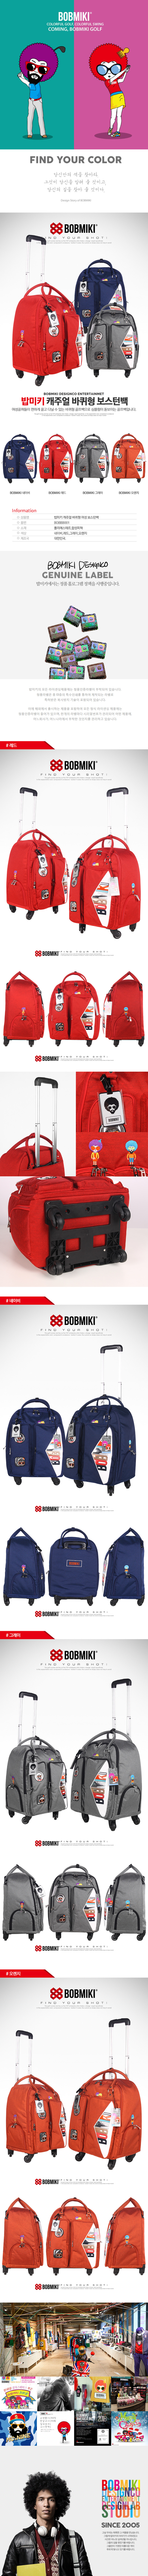 bobmiki_bb001.jpg